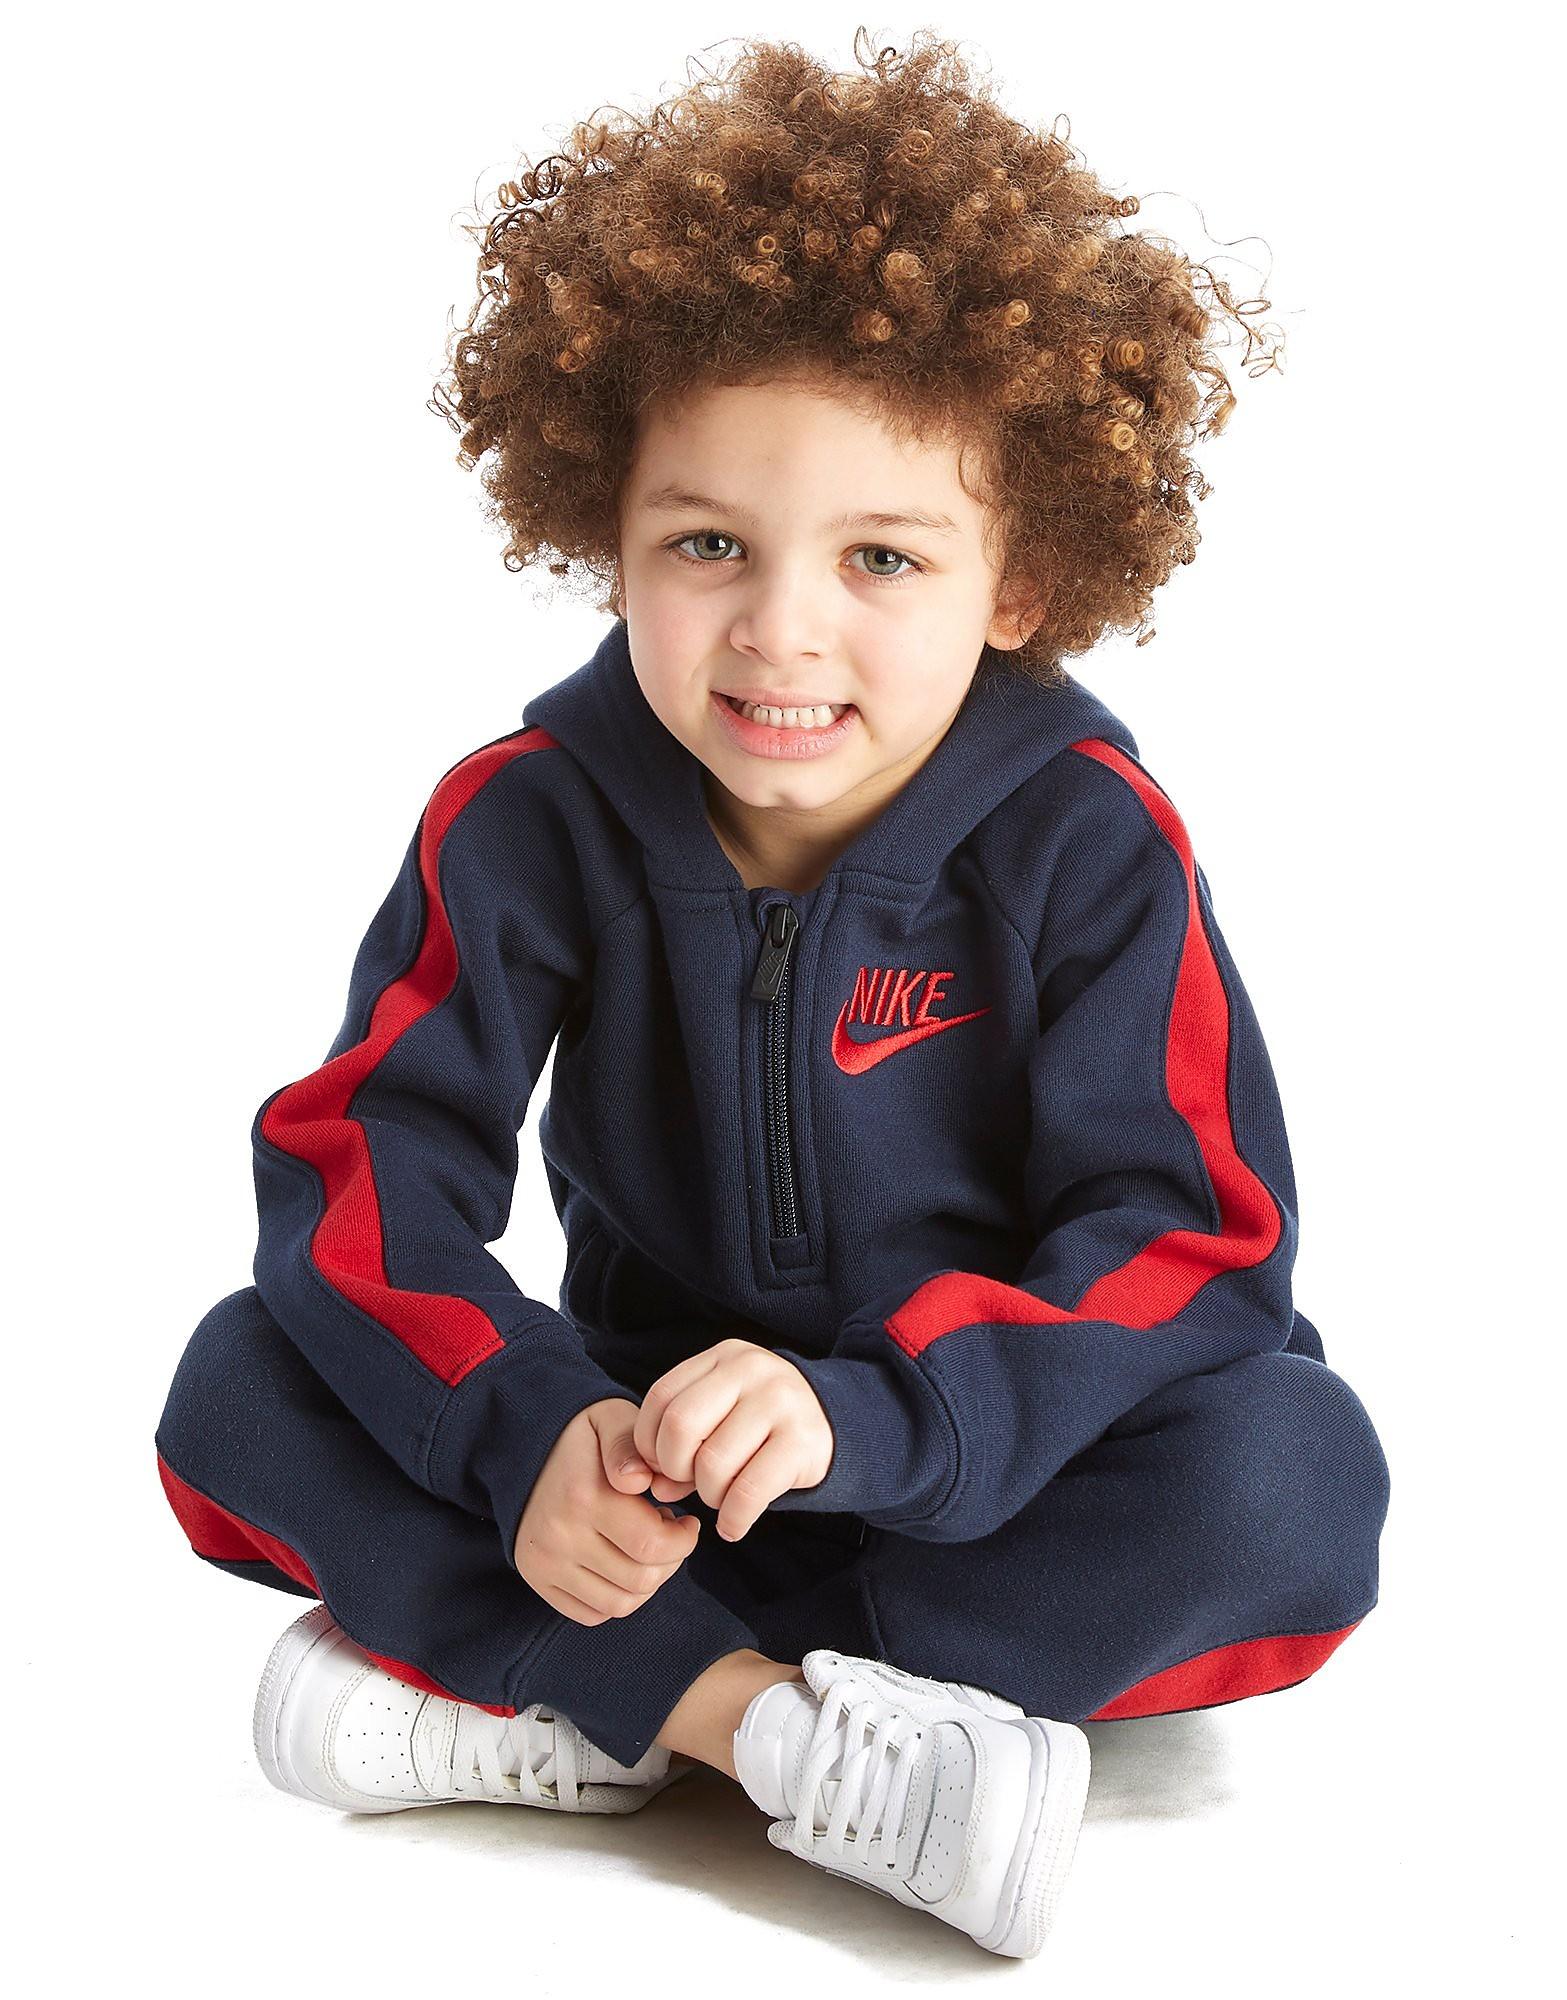 Nike Futura 1/4 Zip Suit Children